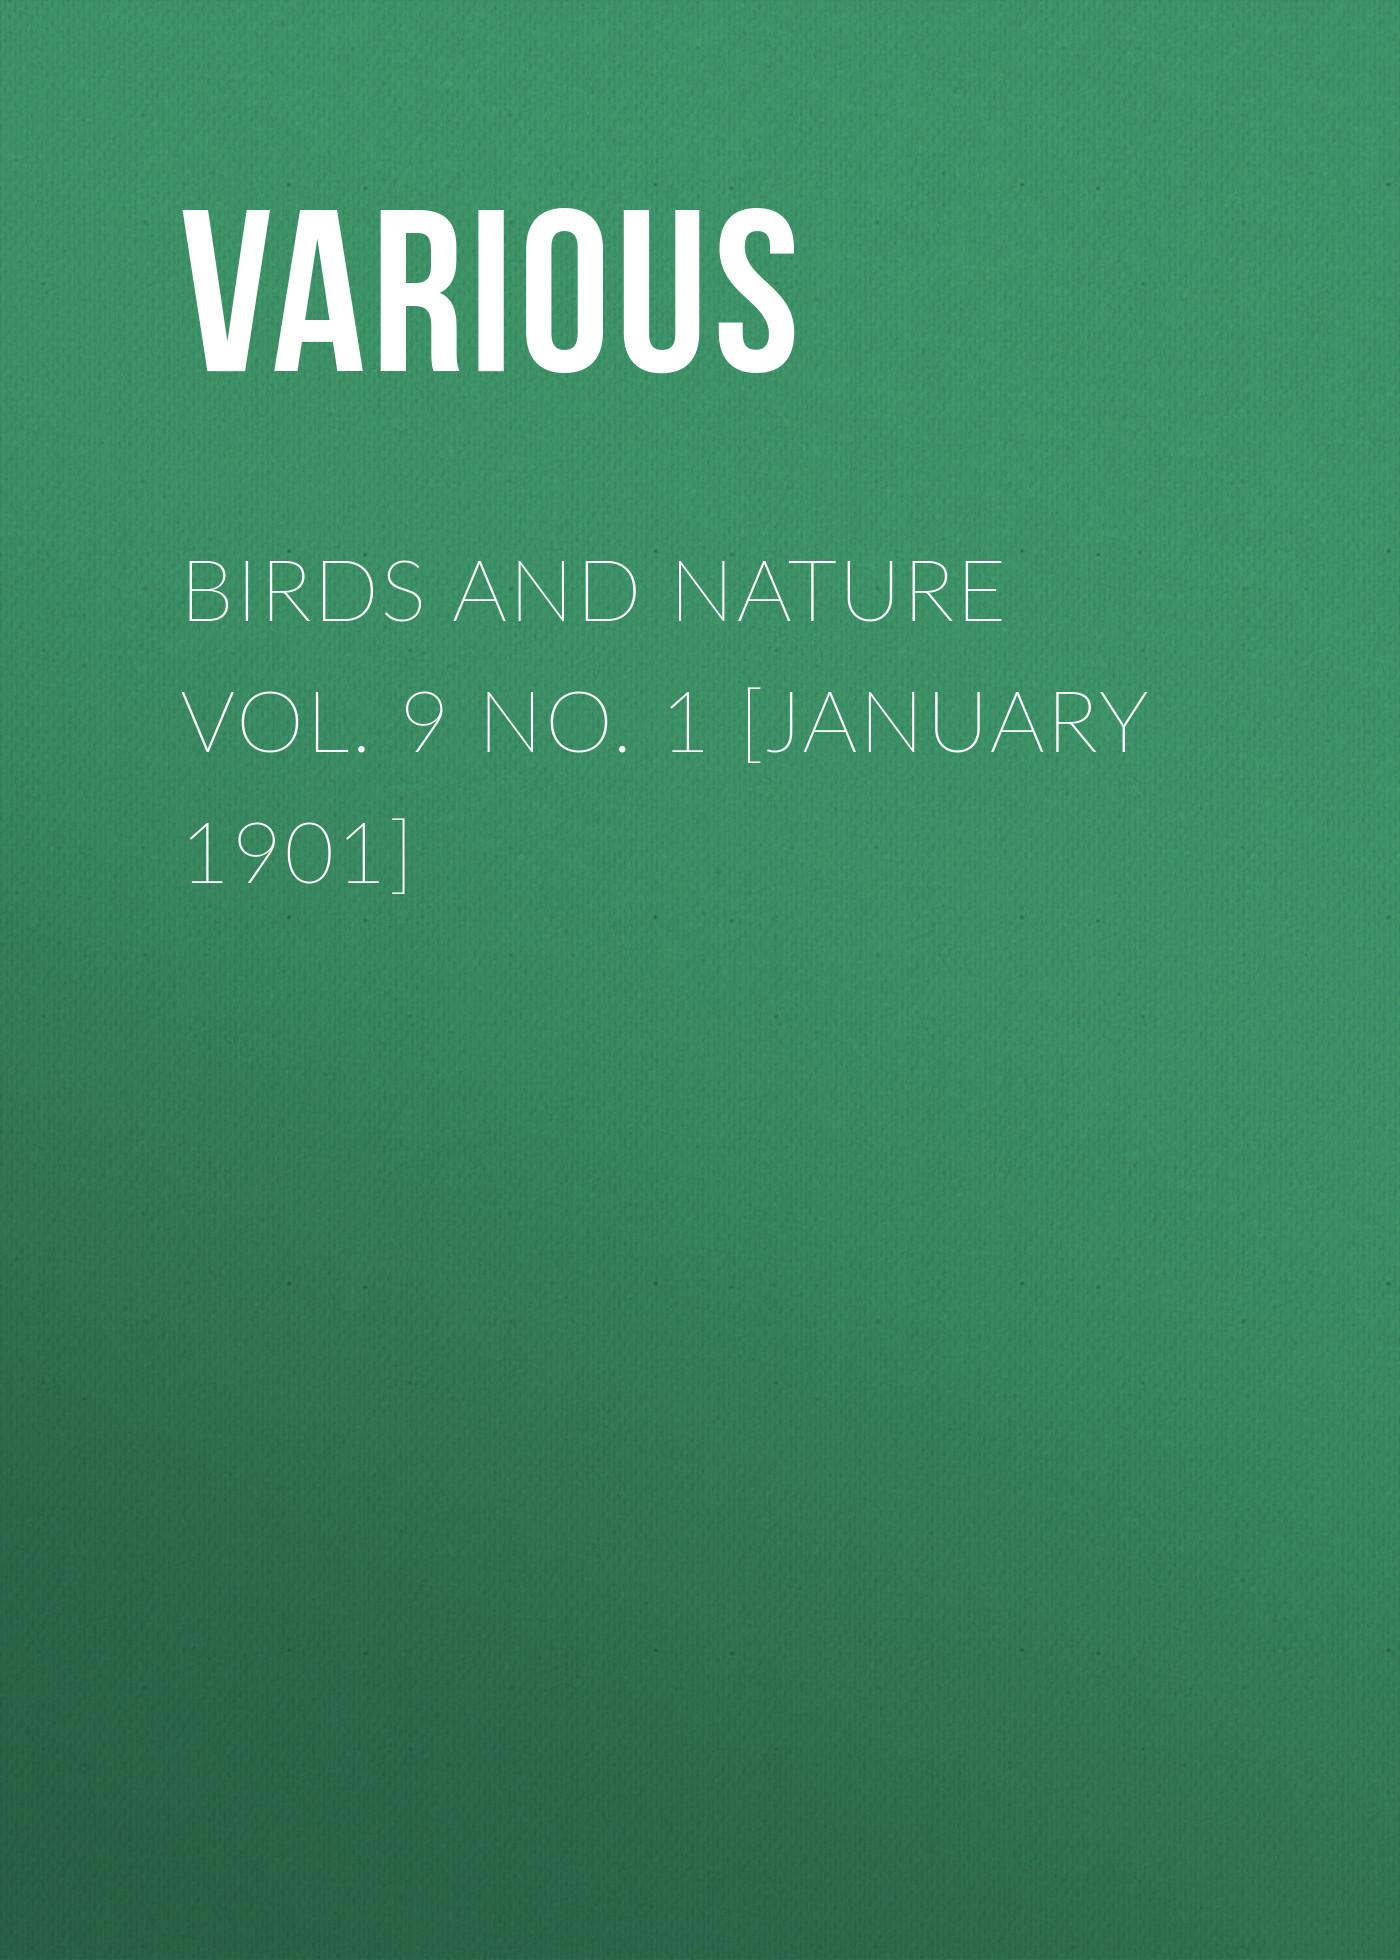 Various Birds and Nature Vol. 9 No. 1 [January 1901] various birds and all nature vol v no 1 january 1899